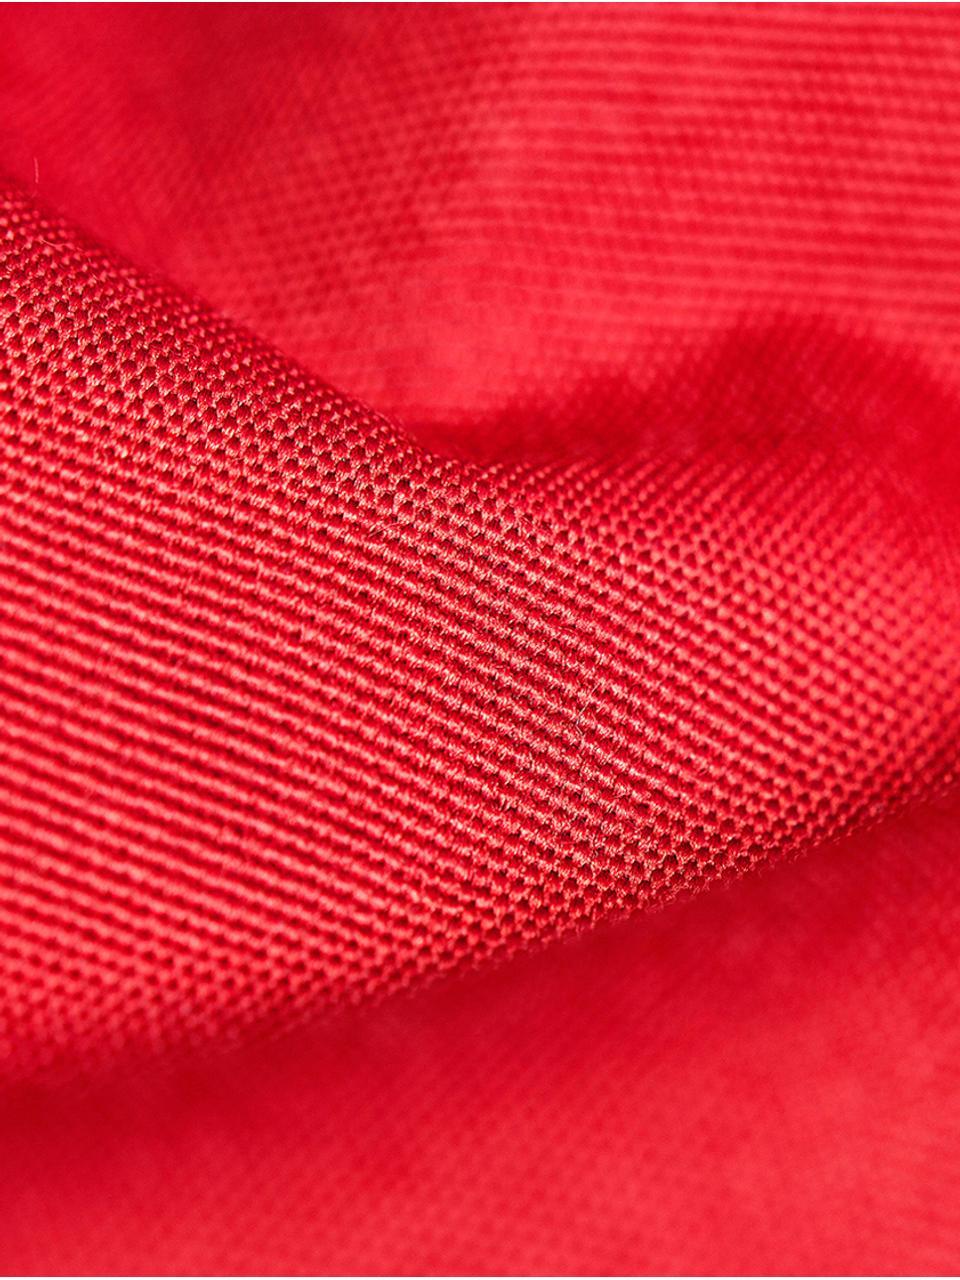 Poltrona sacco grande Meadow, Rivestimento: poliestere, poliuretano, , Rosso, Larg. 130 x Alt. 160 cm